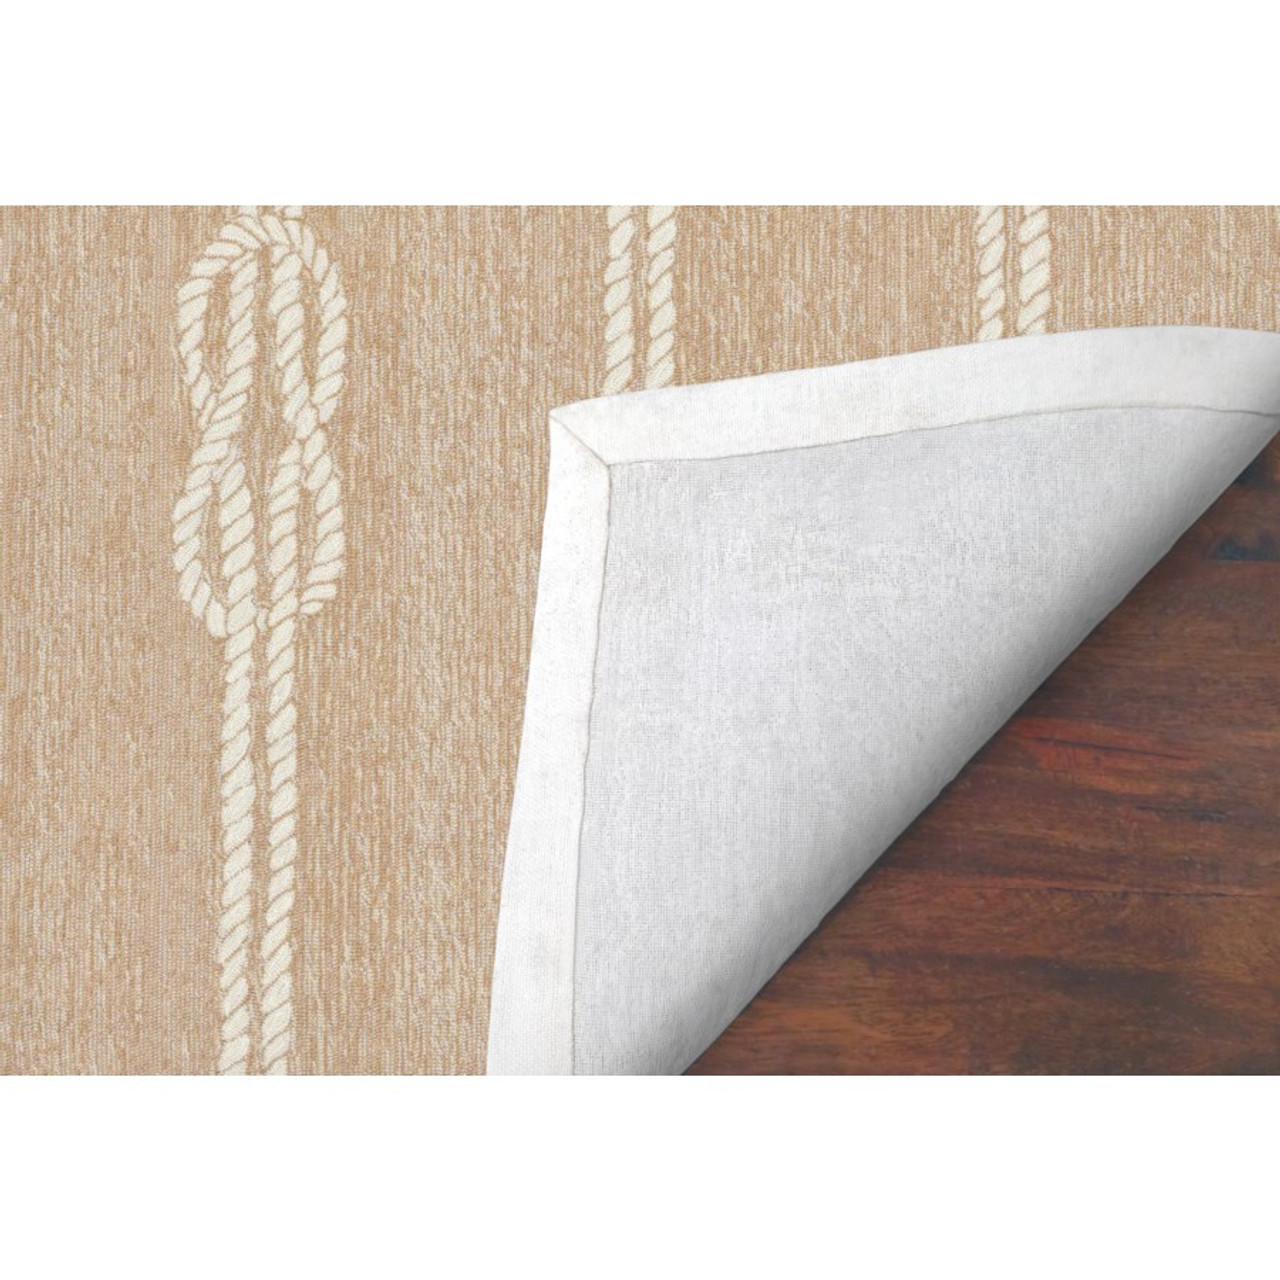 Neutral Capri Nautical Ropes Indoor/Outdoor Rug -  Backing